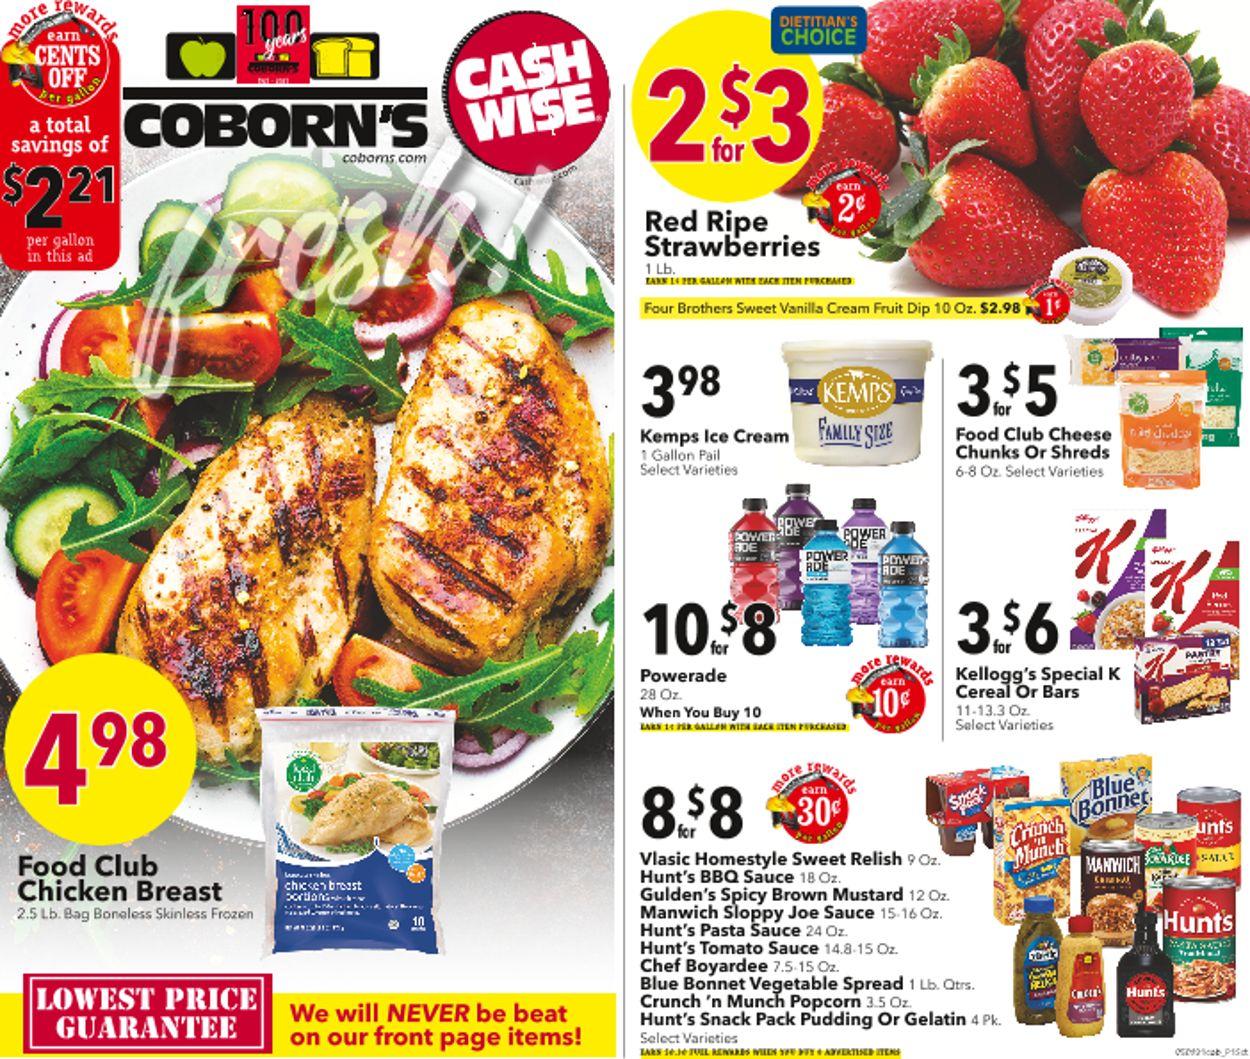 Cash Wise Weekly Ad Circular - valid 05/12-05/18/2021